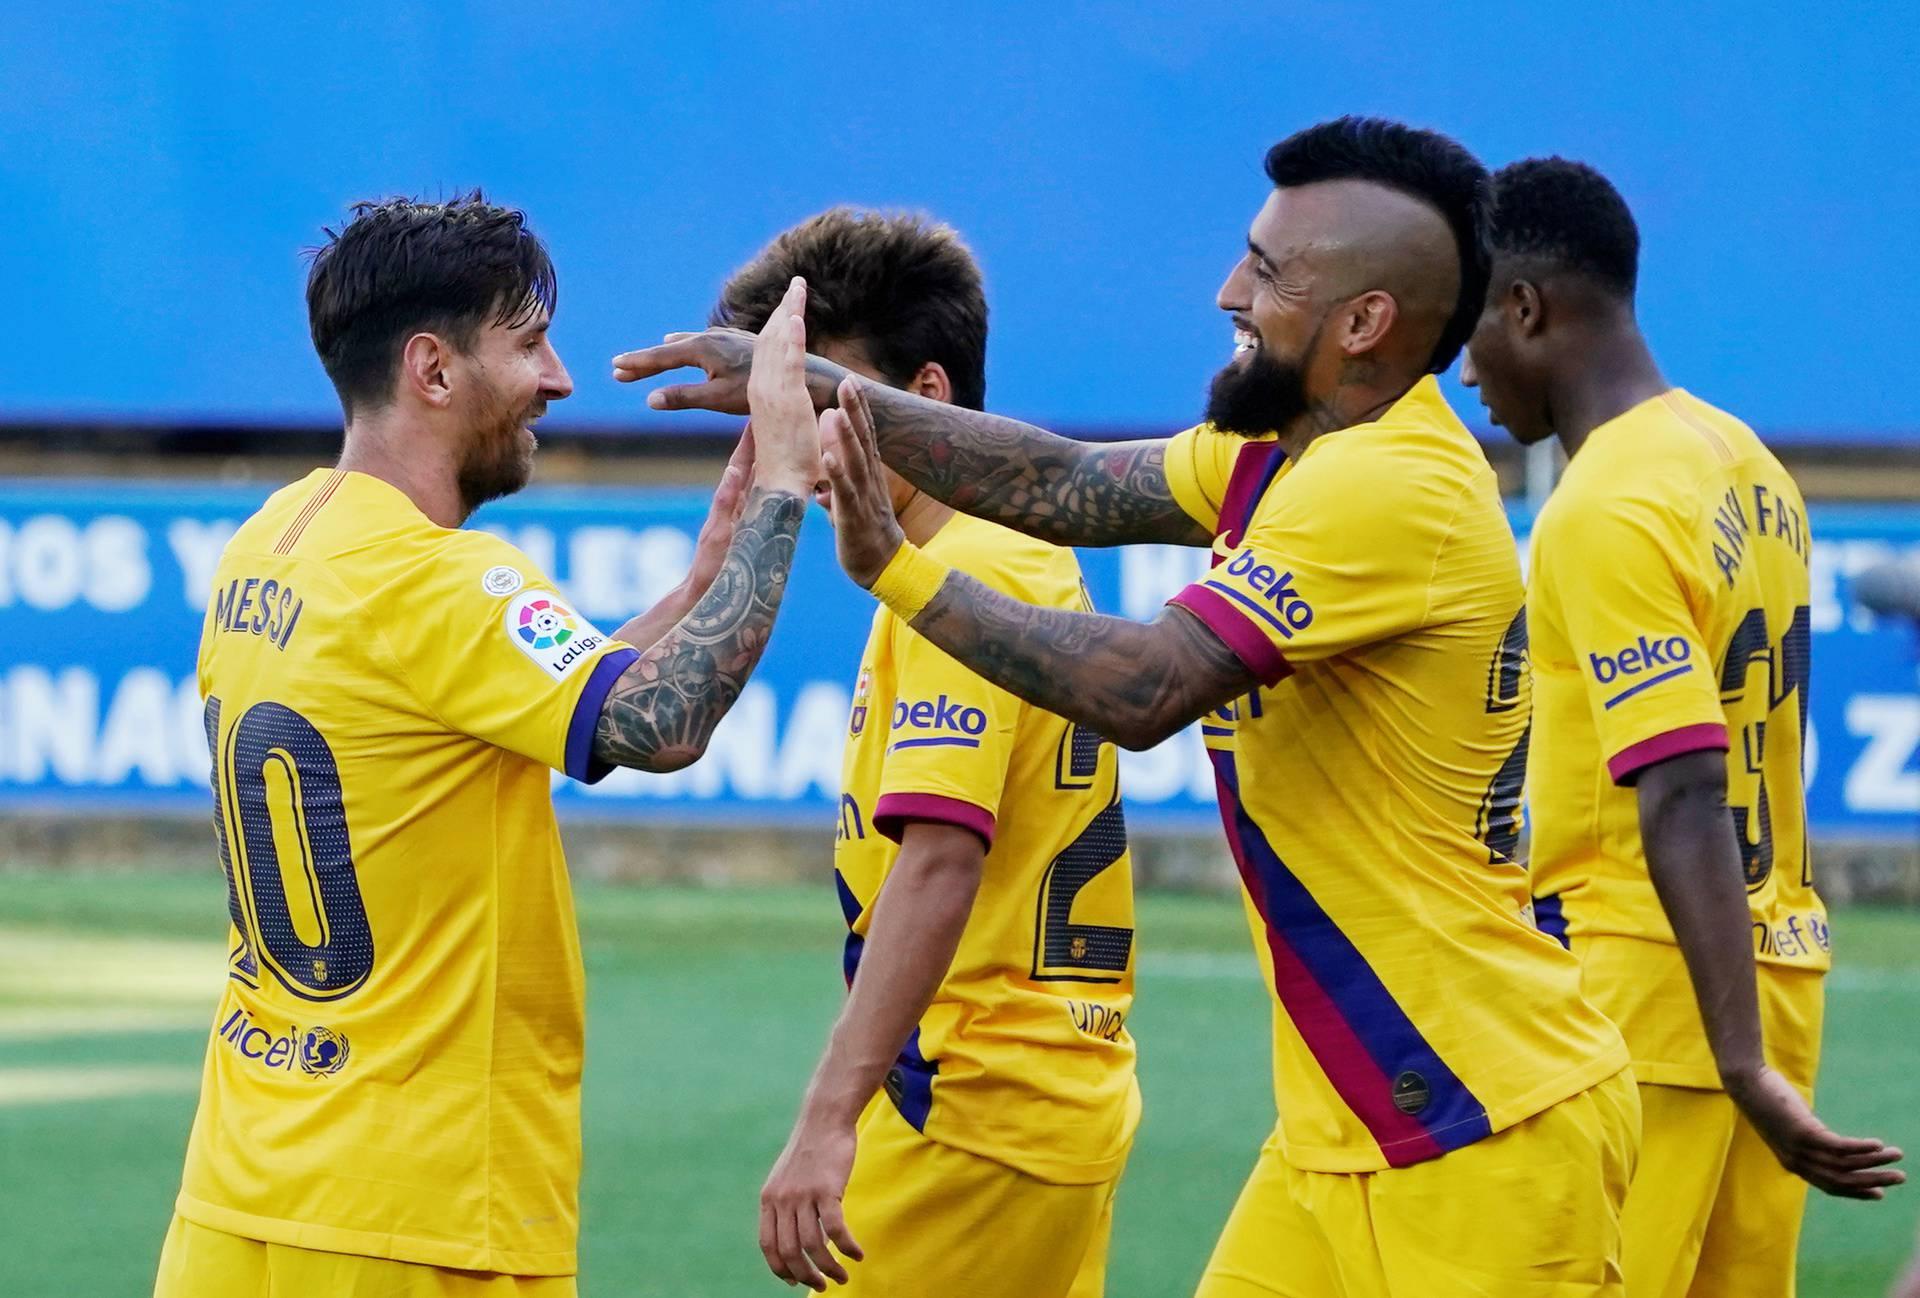 La Liga Santander - Deportivo Alaves v FC Barcelona